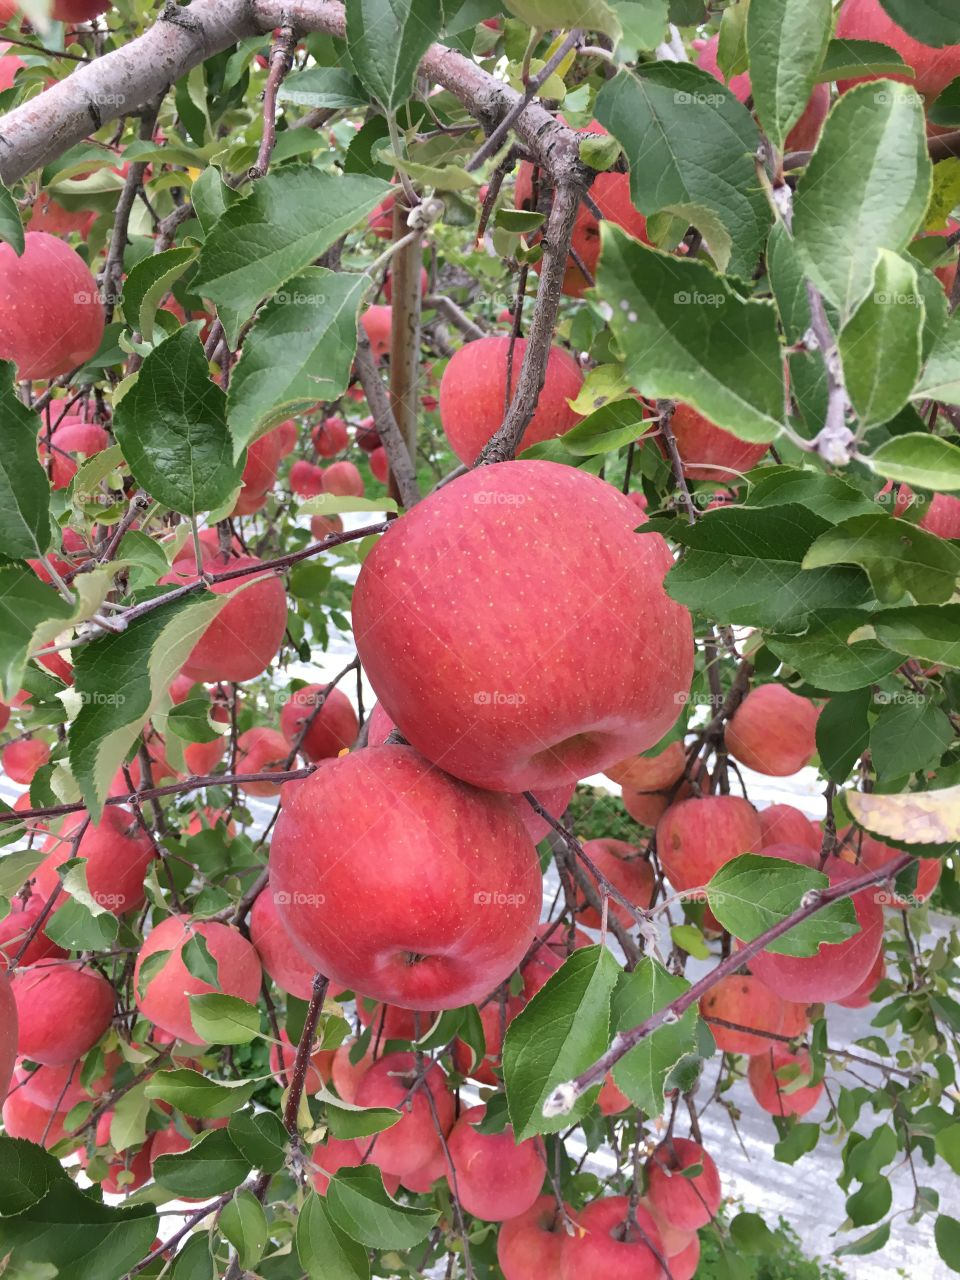 Japanese apples of 1kg each in Yamagata, Japan